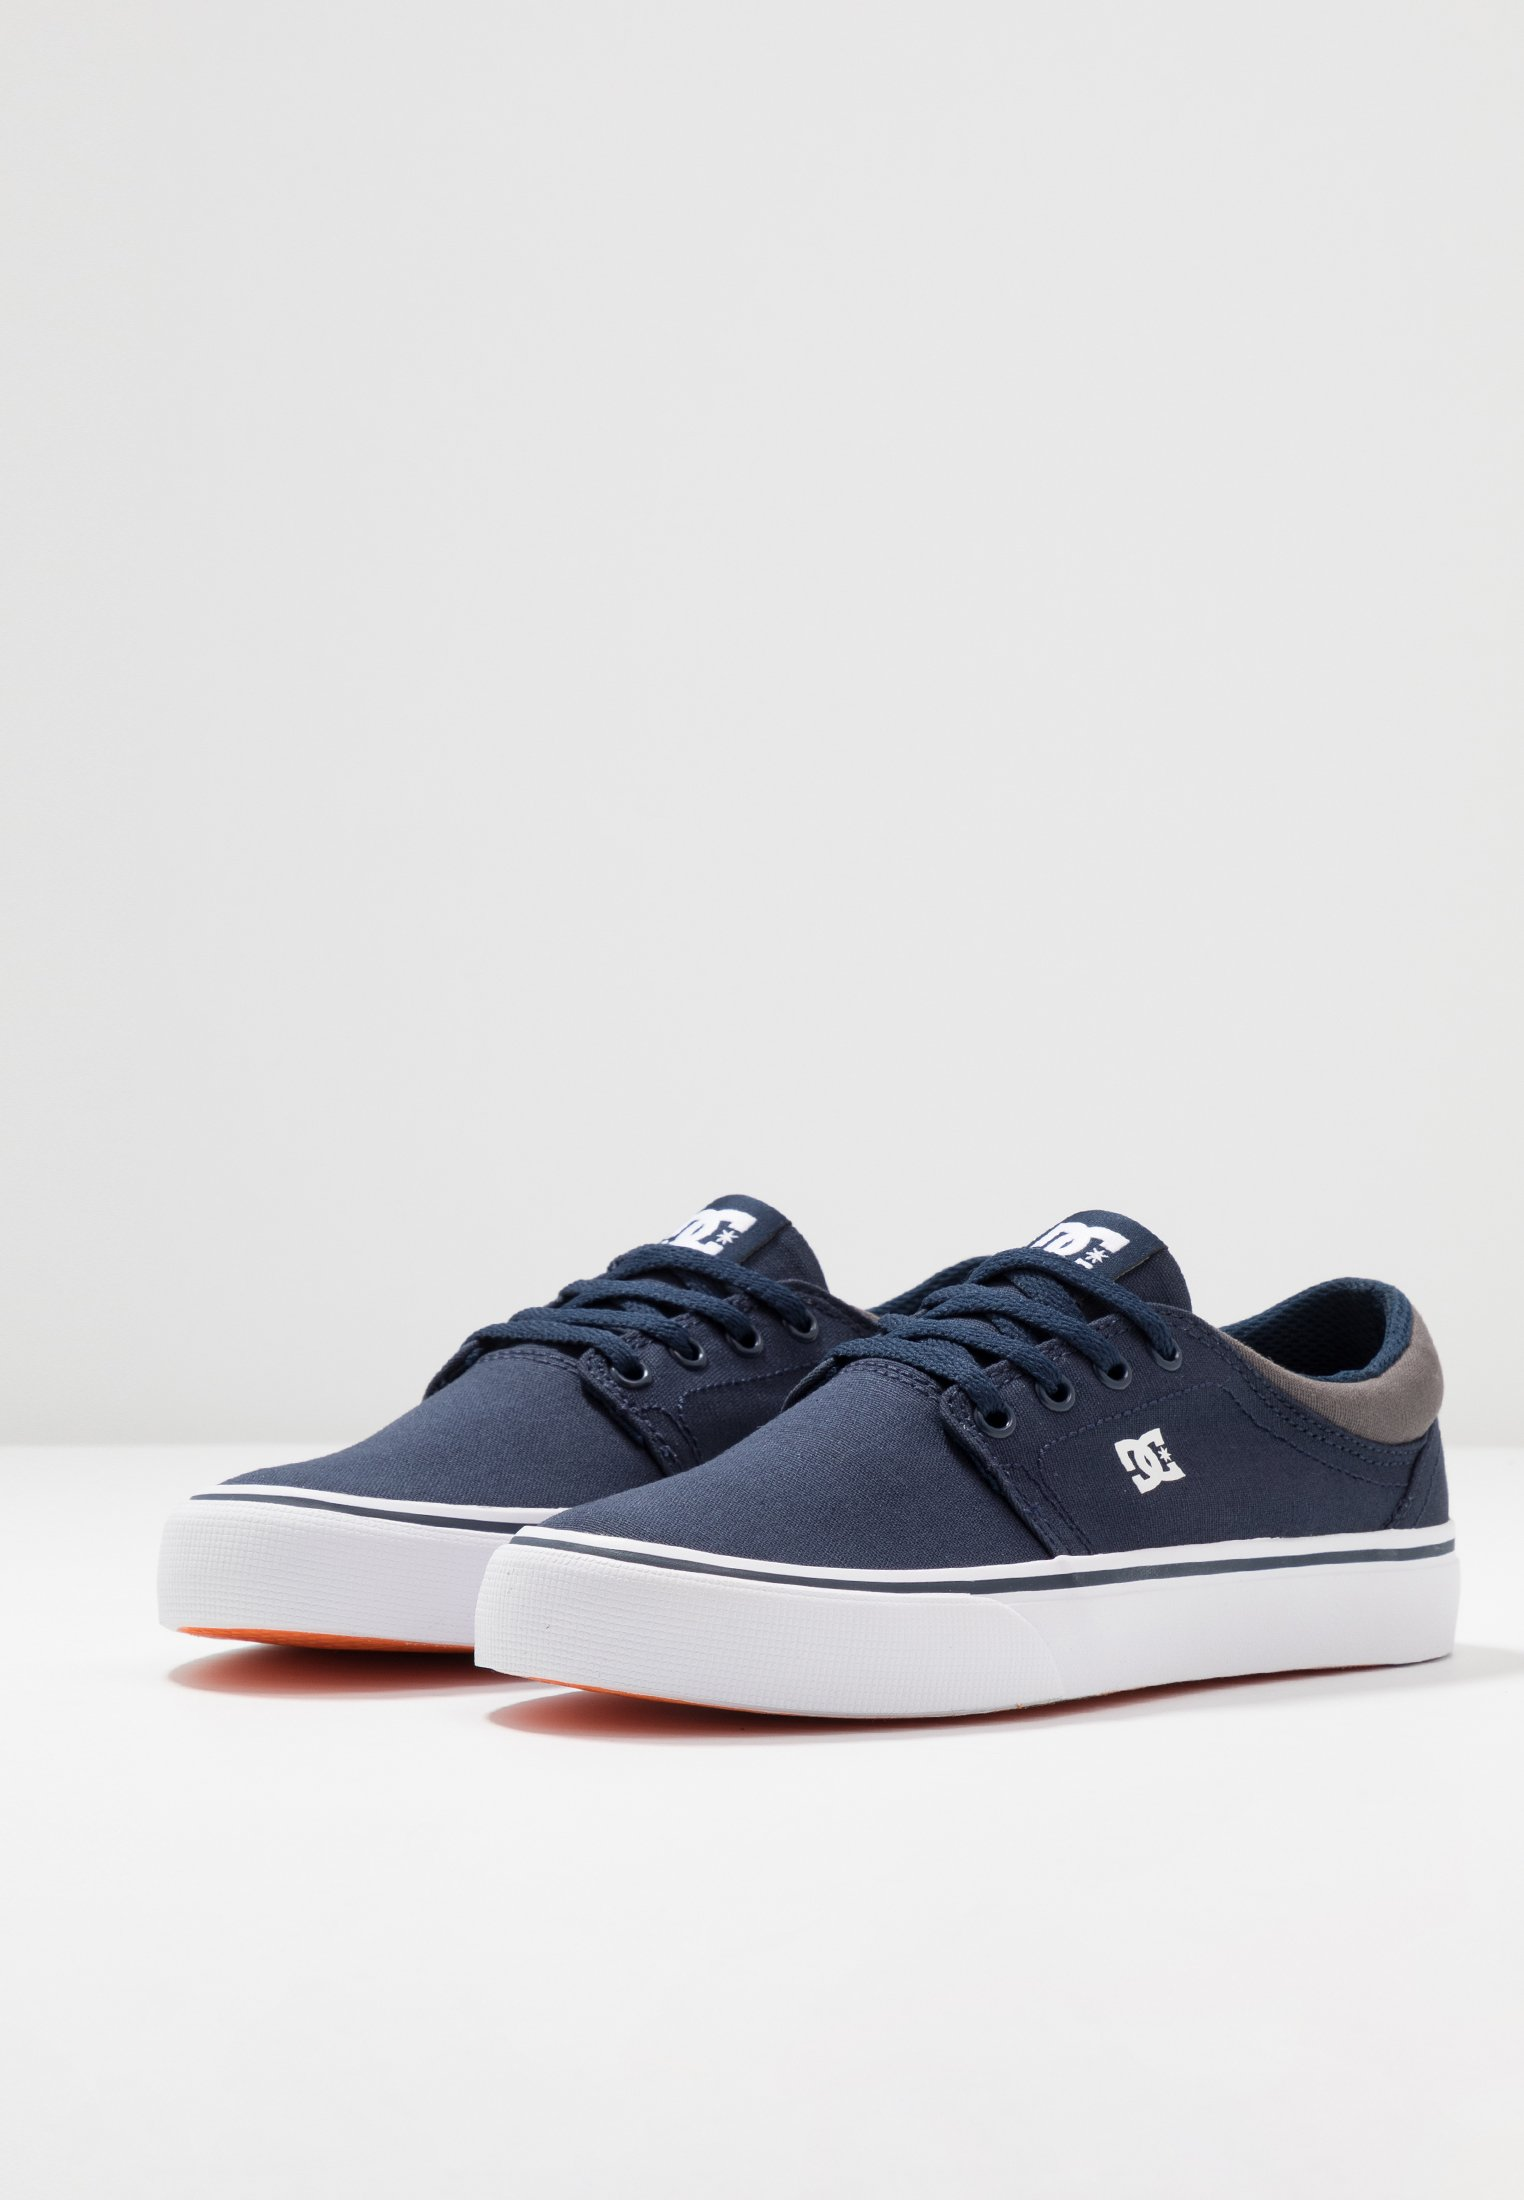 Shoes TRASEBaskets navy basses DC white TFlJ51uKc3